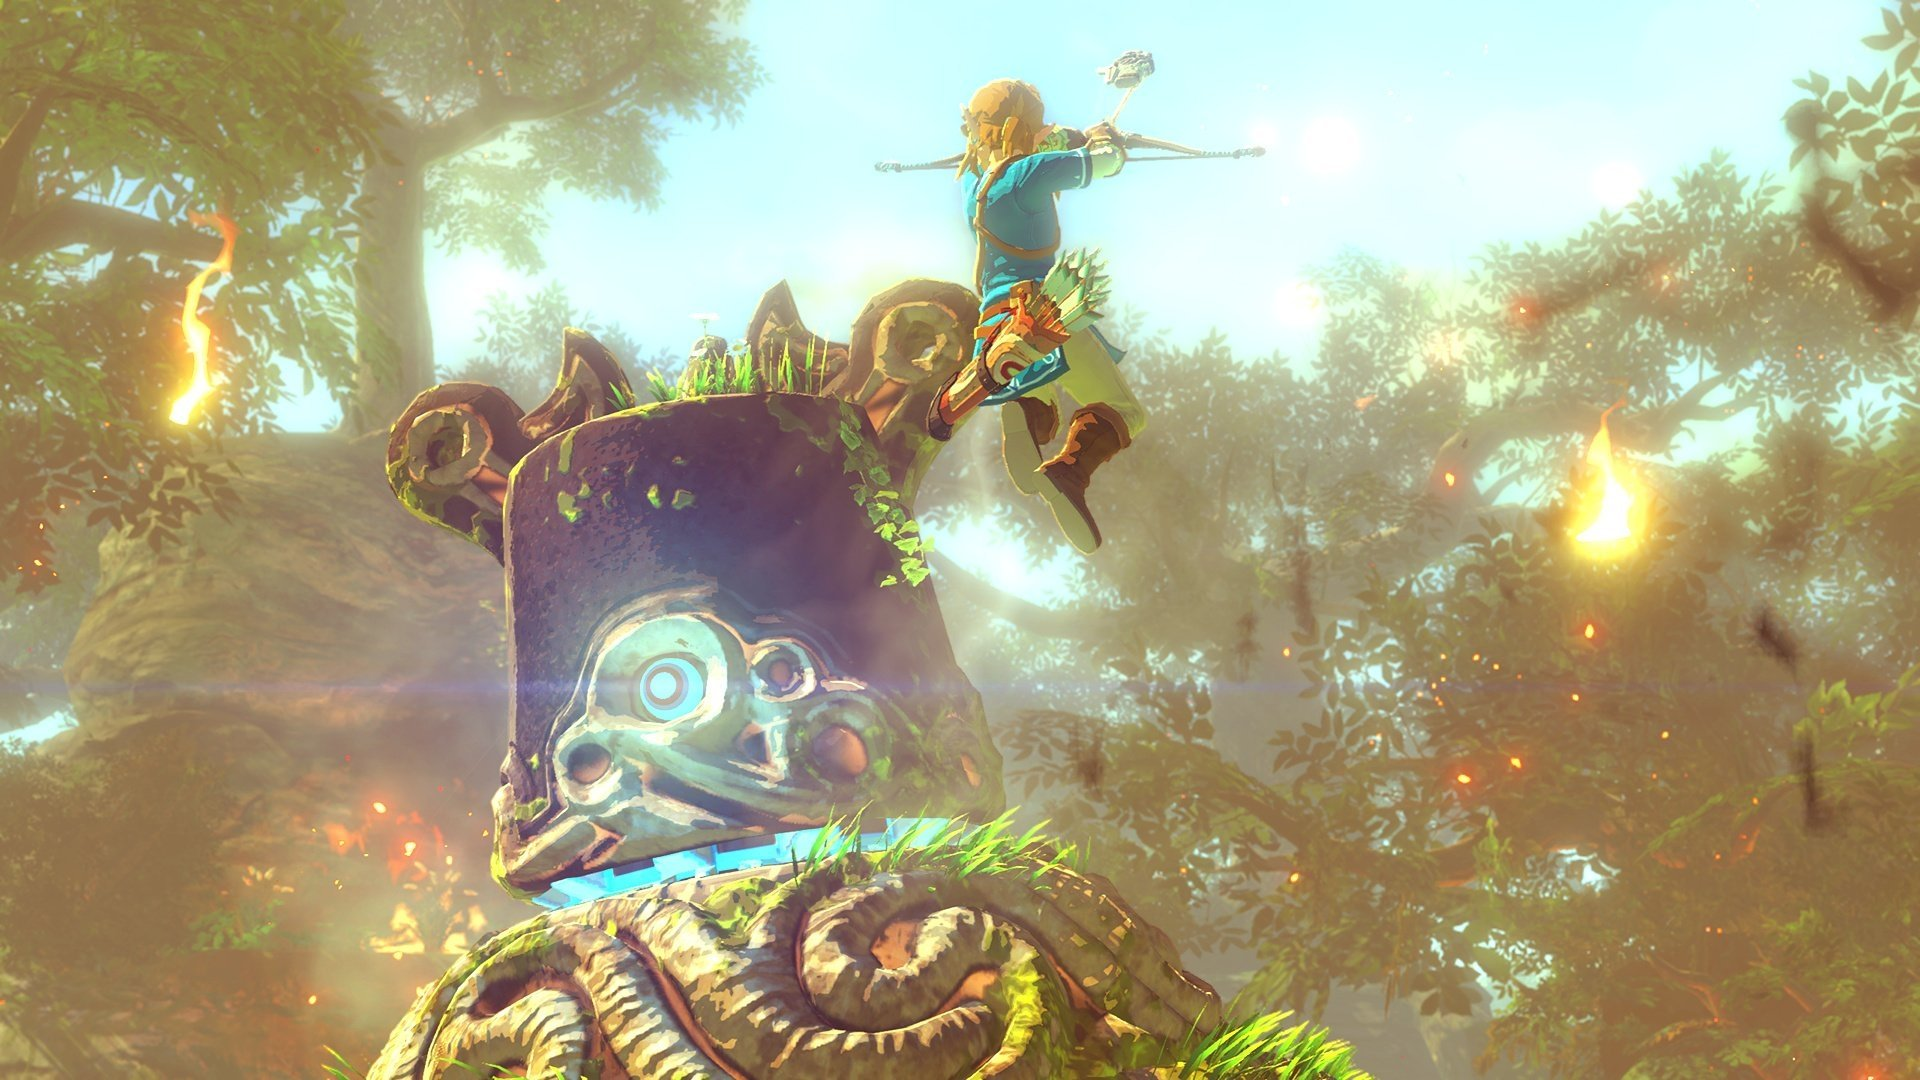 Video Game - The Legend of Zelda: Breath of the Wild  Wallpaper